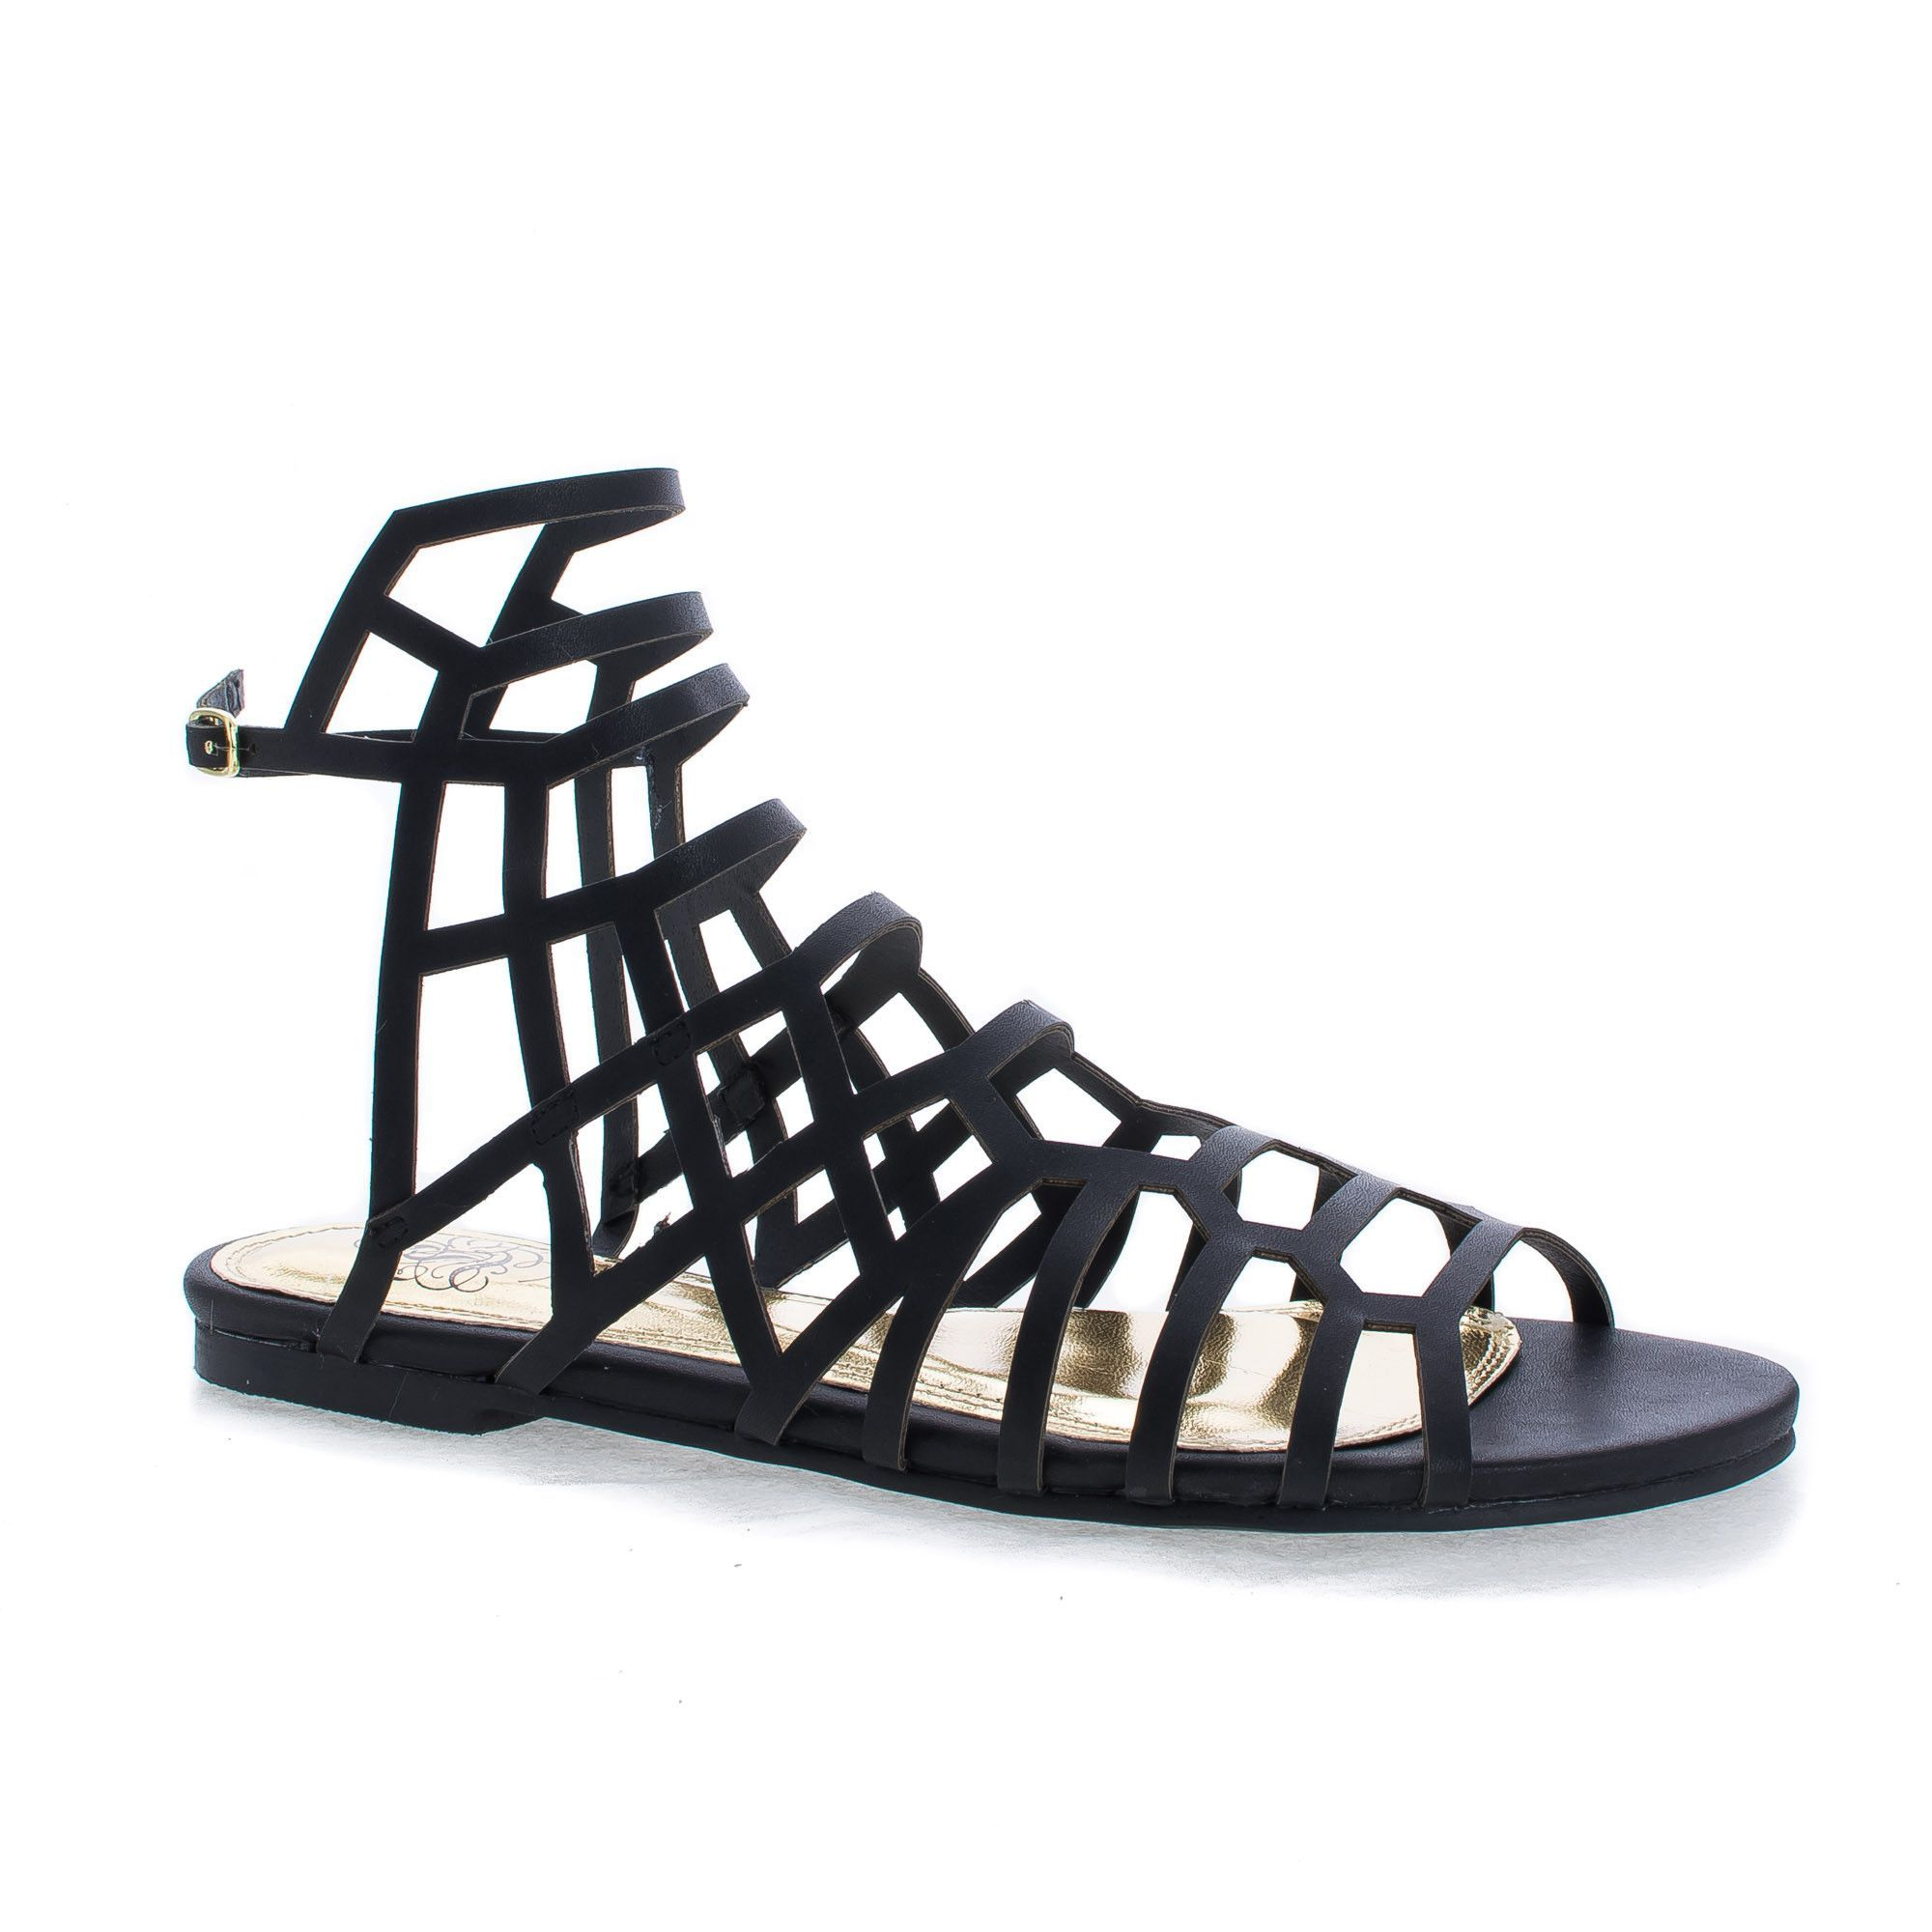 Black evening sandals flat - Ciciml Open Toe Honeycomb Caged Ankle Flat Sandals